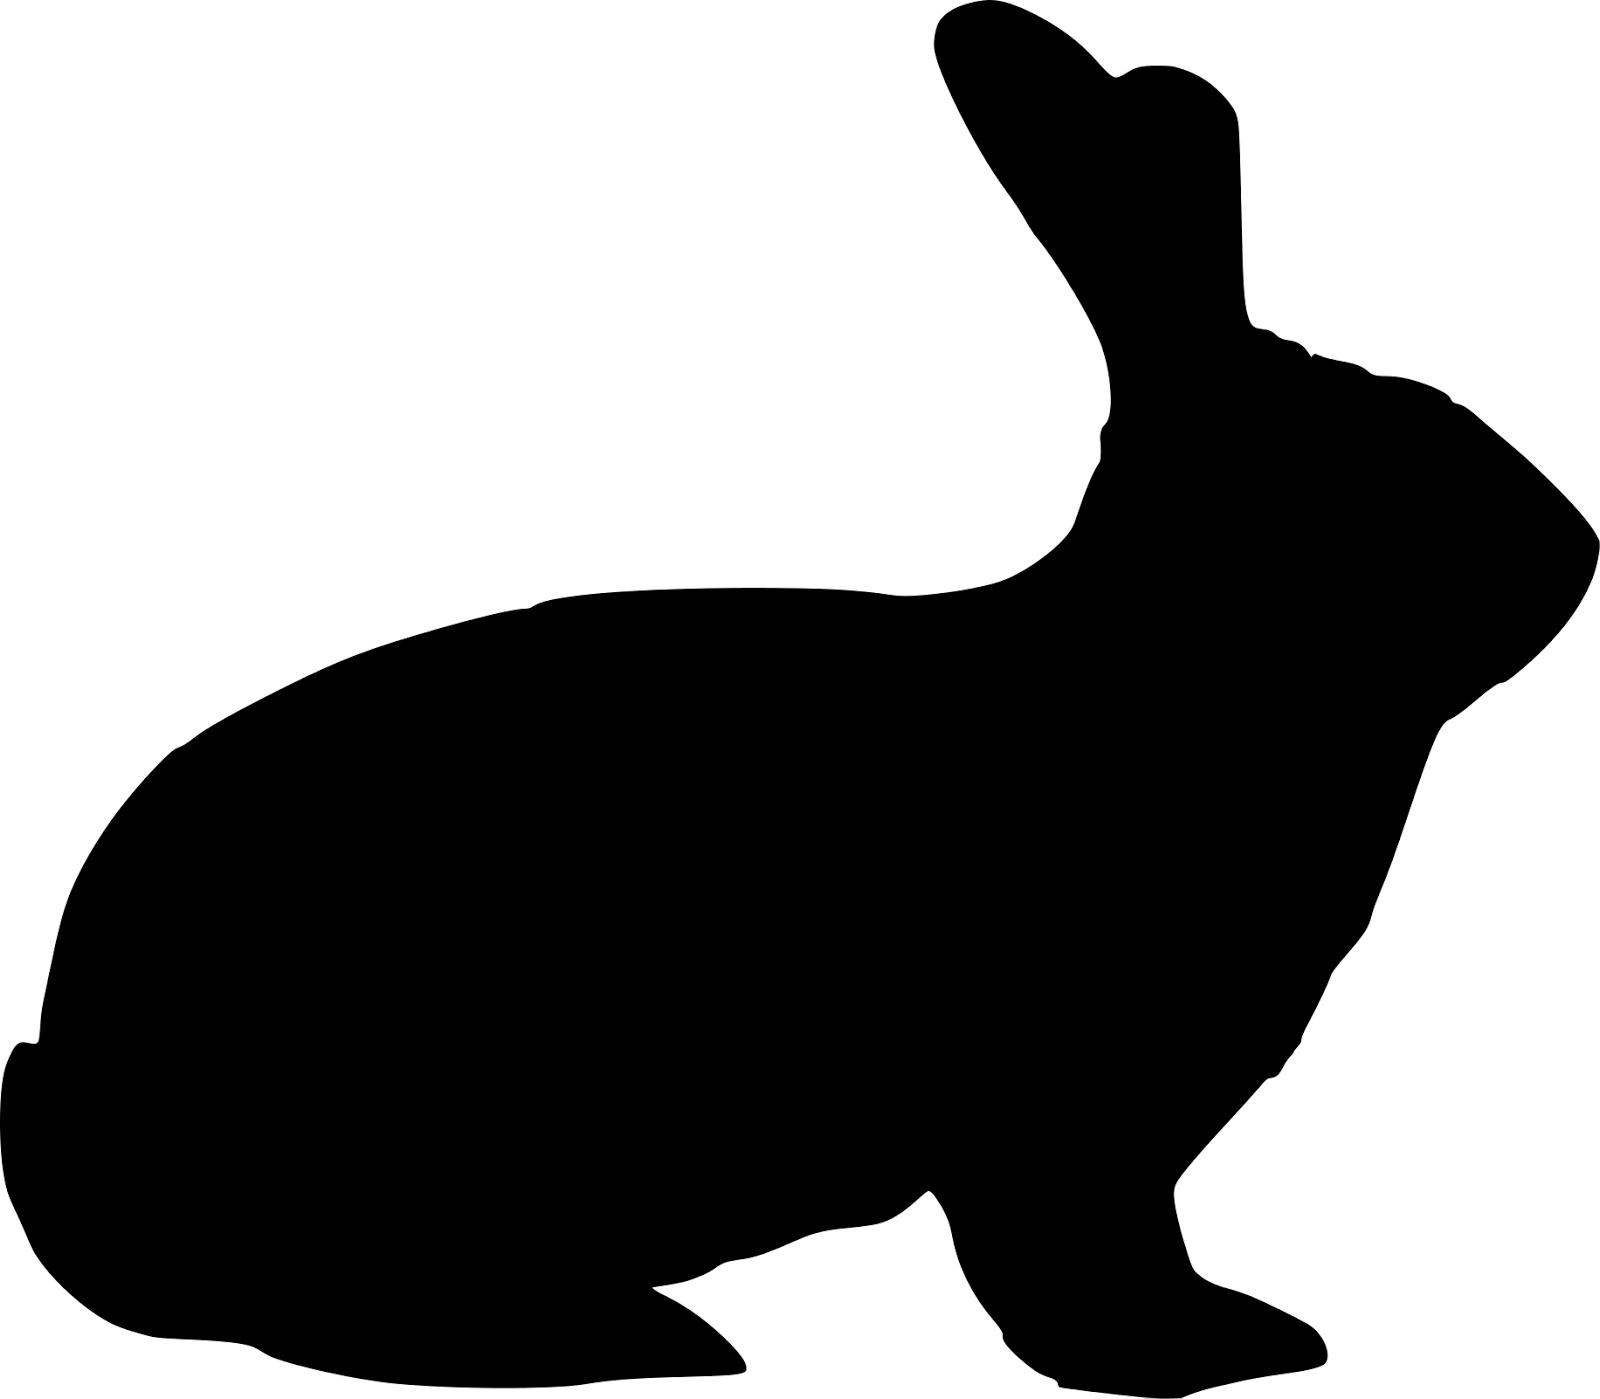 Easter Bunny Hare Rabbit Silhouette Clip art.